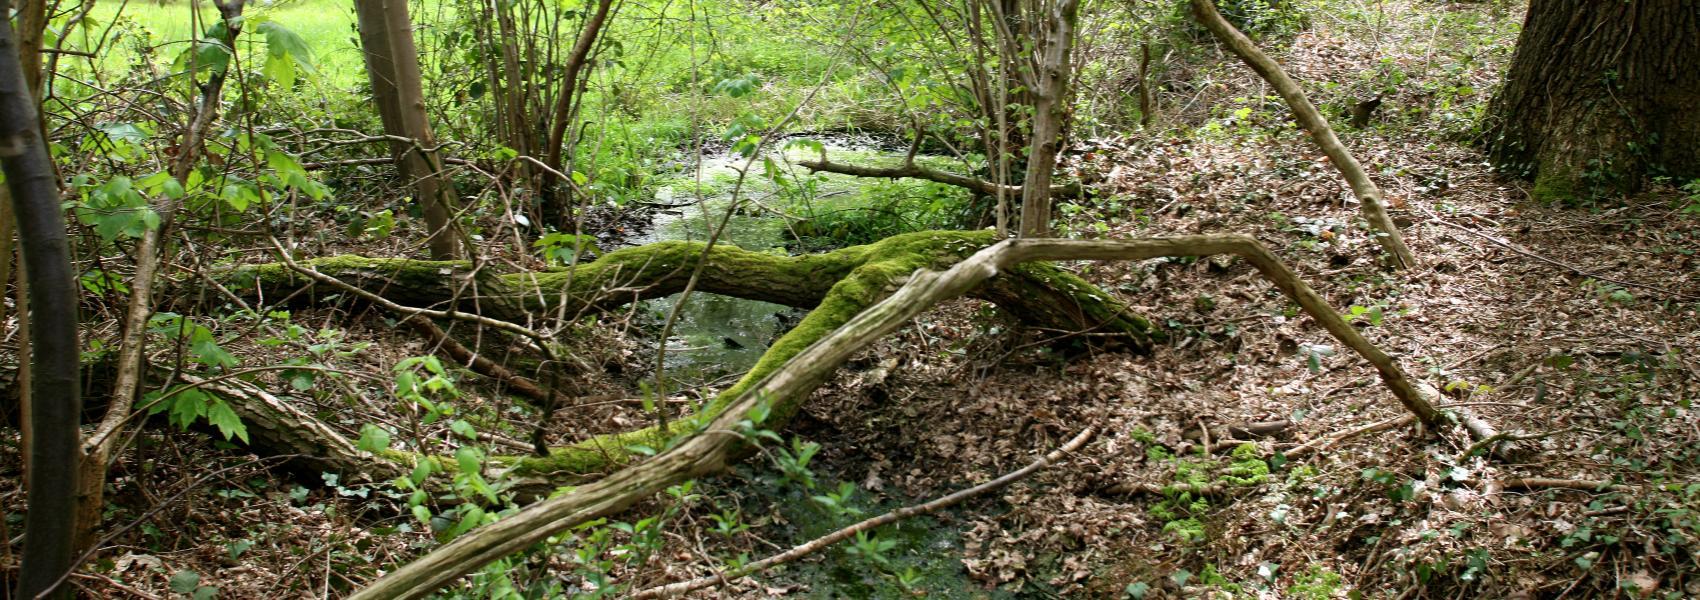 beekje in het bos